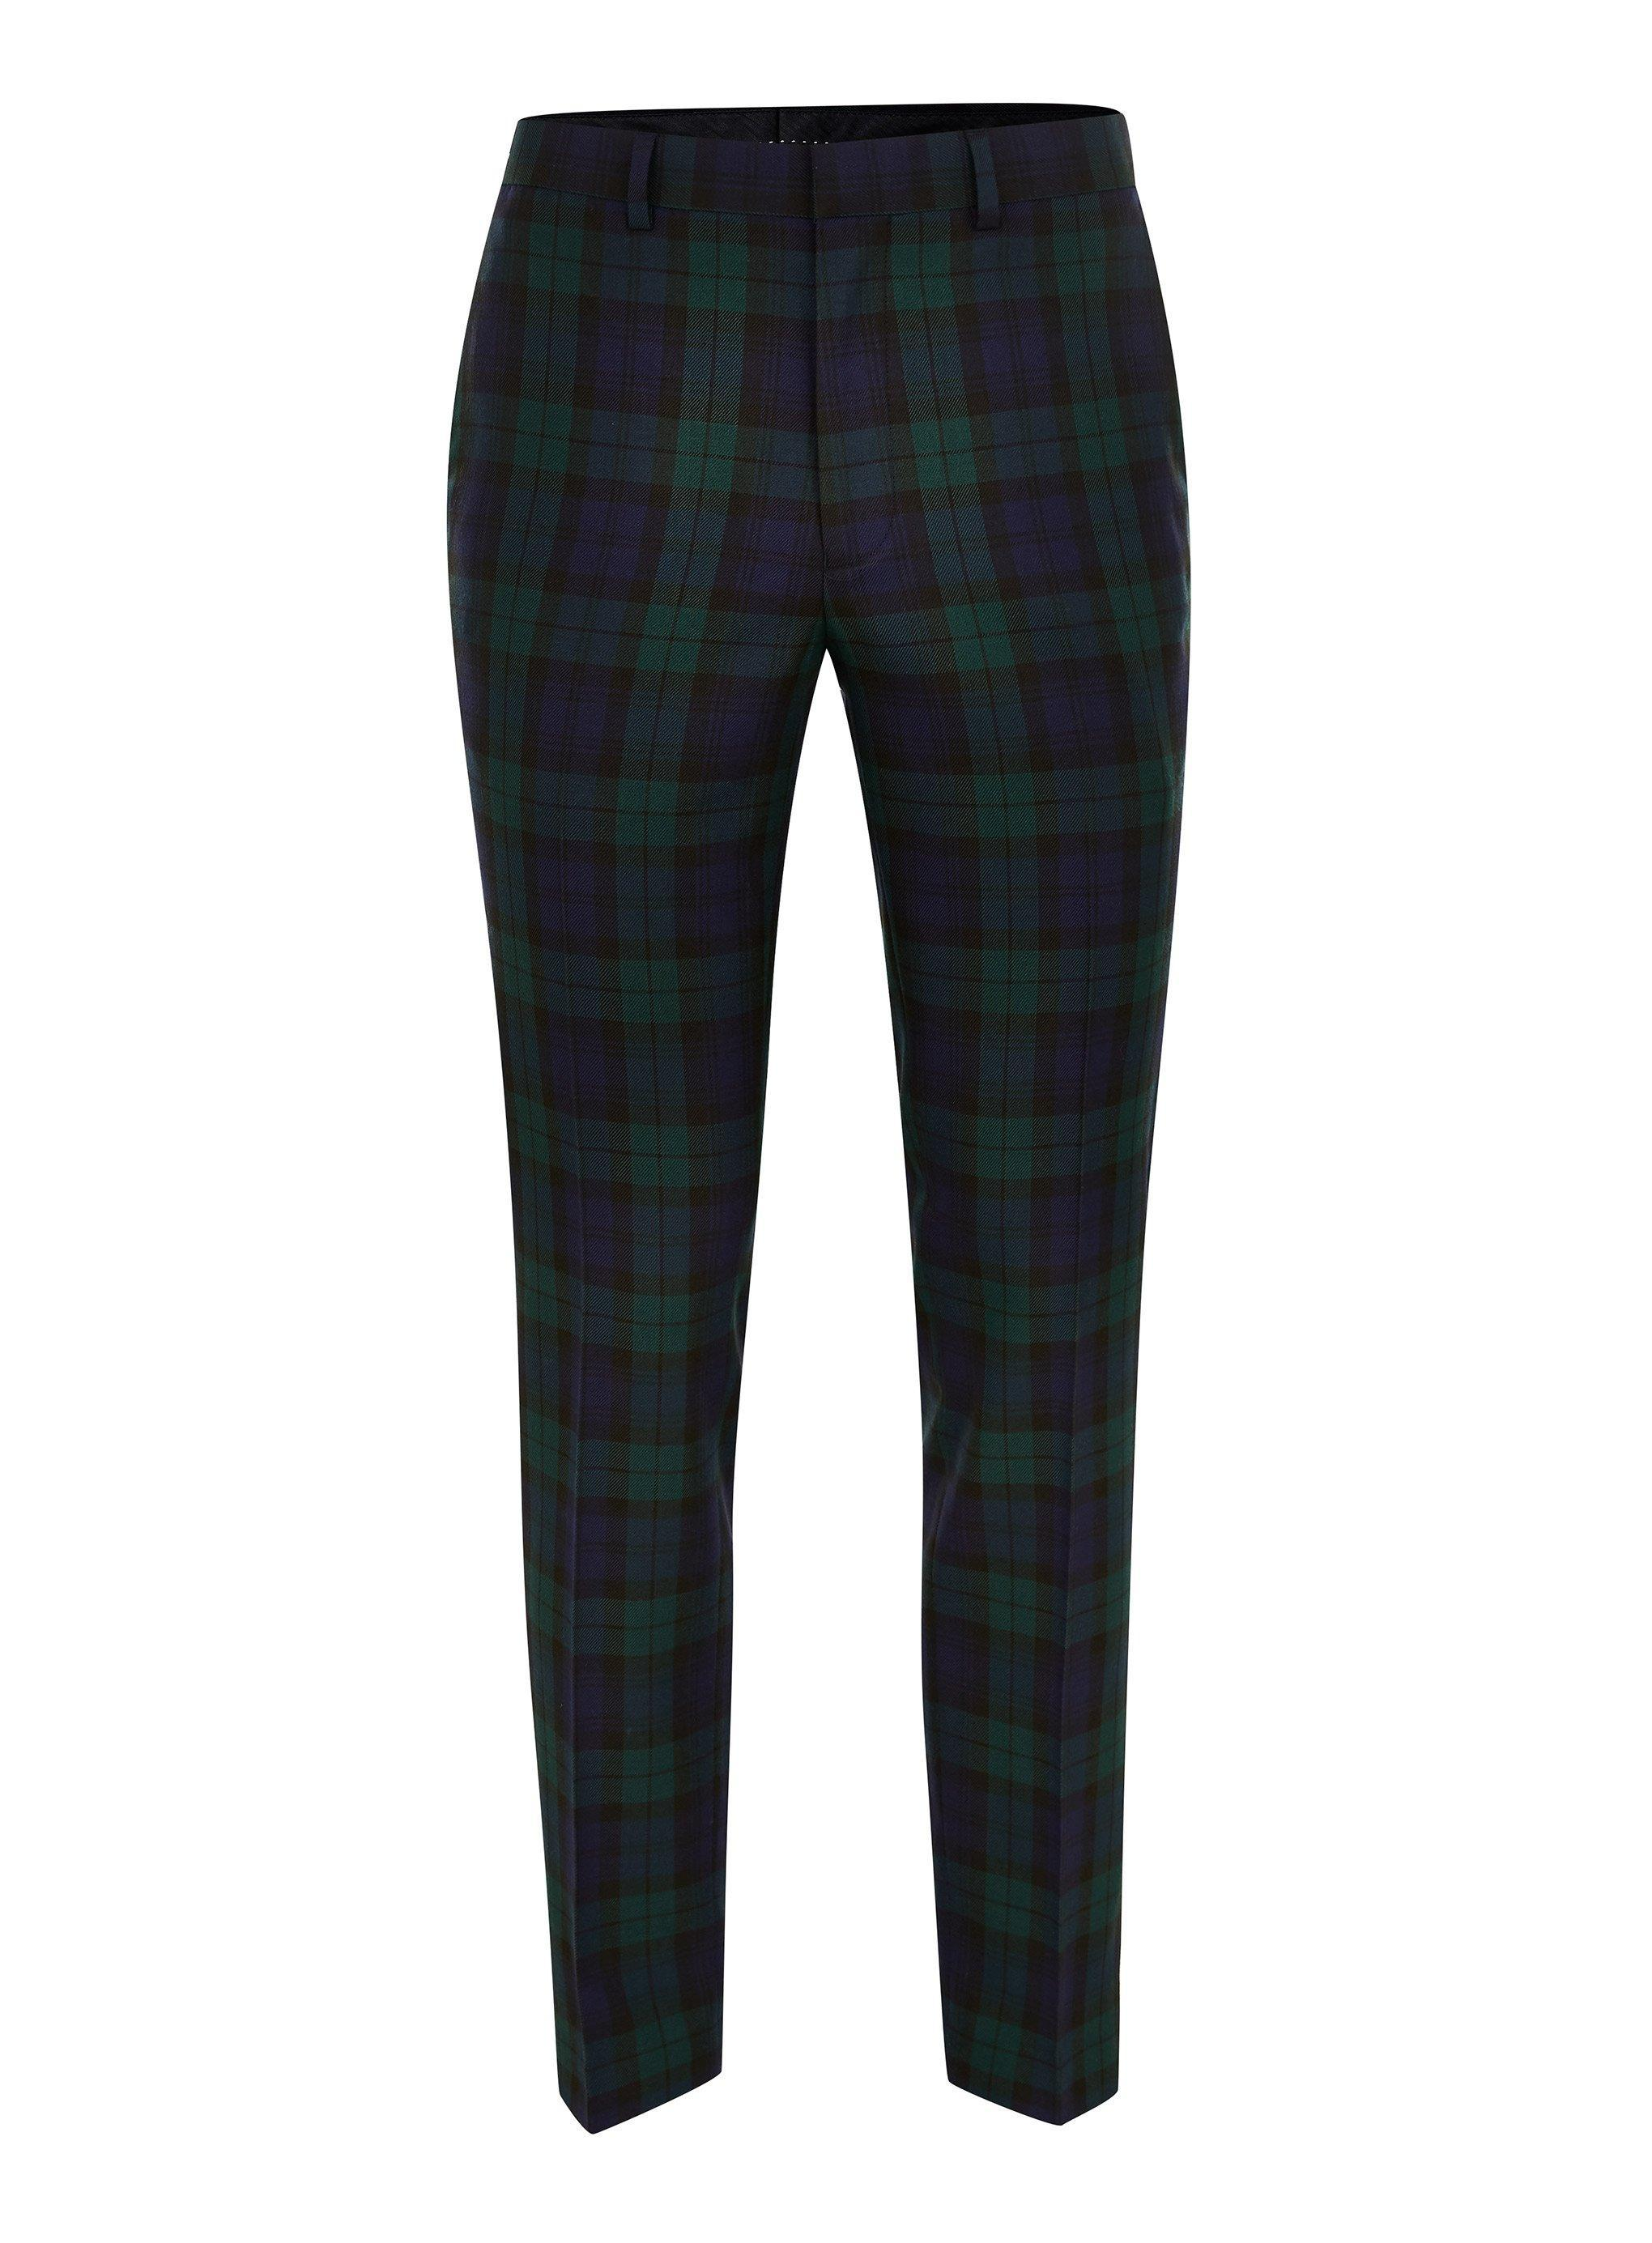 f7b33aef4 Lyst - TOPMAN Navy Green Check Dress Pant in Black for Men